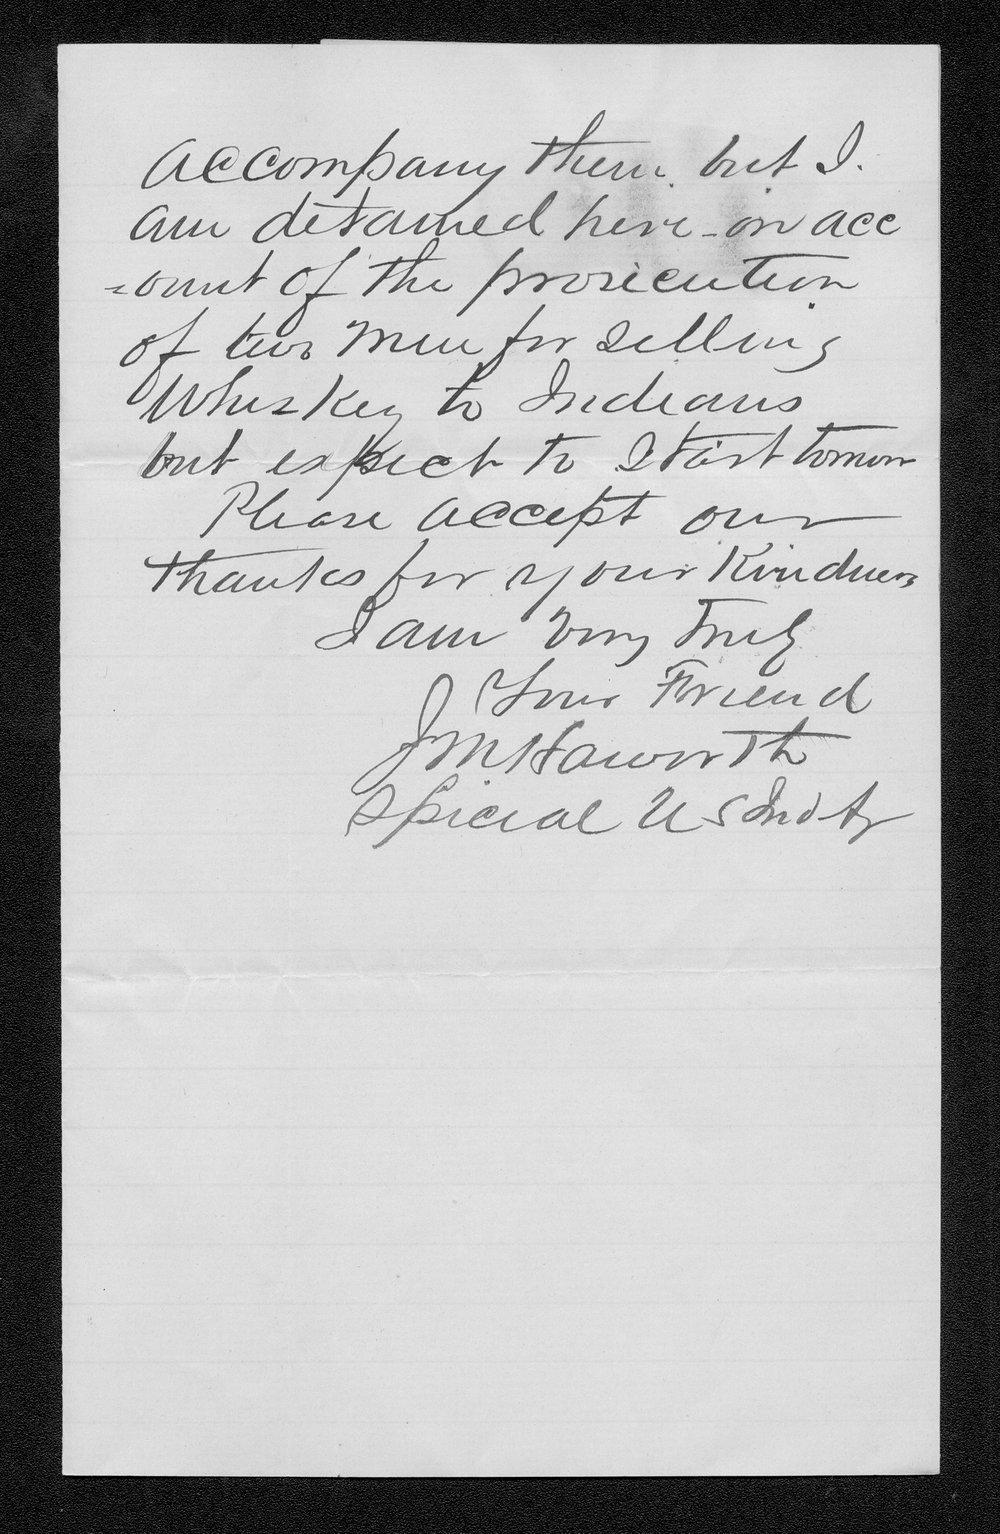 J.M. Haworth to Governor John St. John - 2